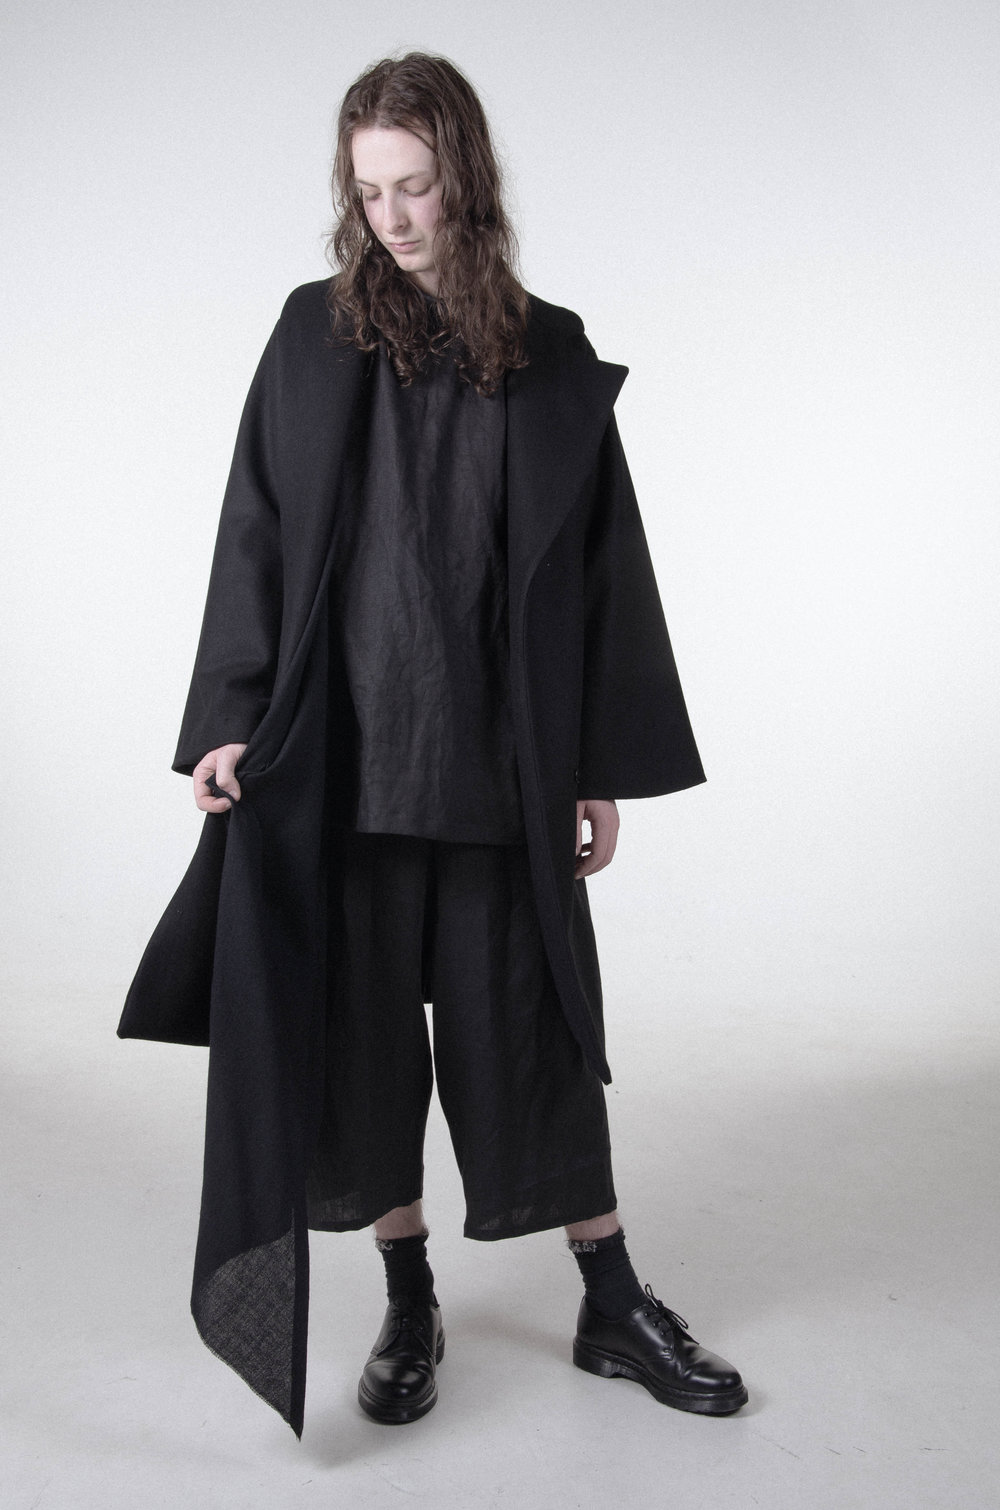 agoraphobia-collective-britt-pooley-50-50-bowie-coat